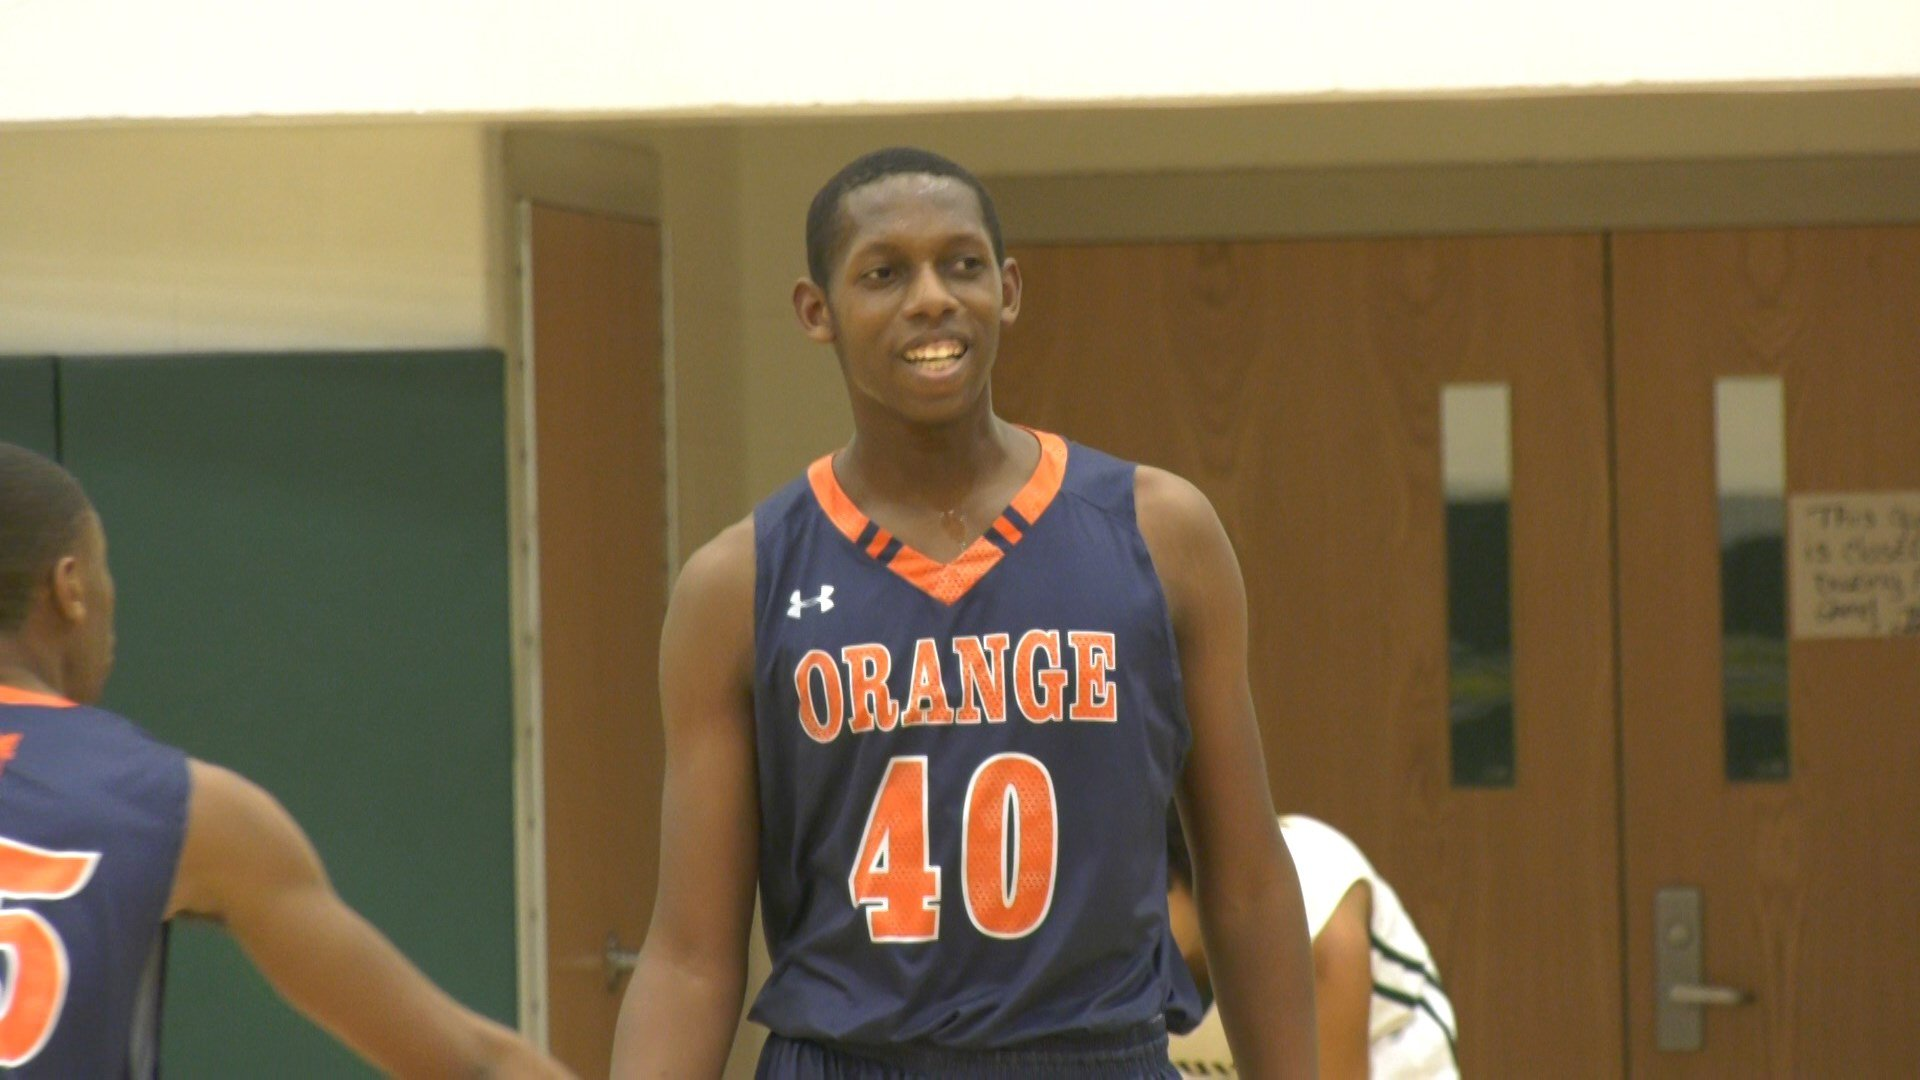 Kaeshaun Braxton scored a game-high 21 points for Orange County